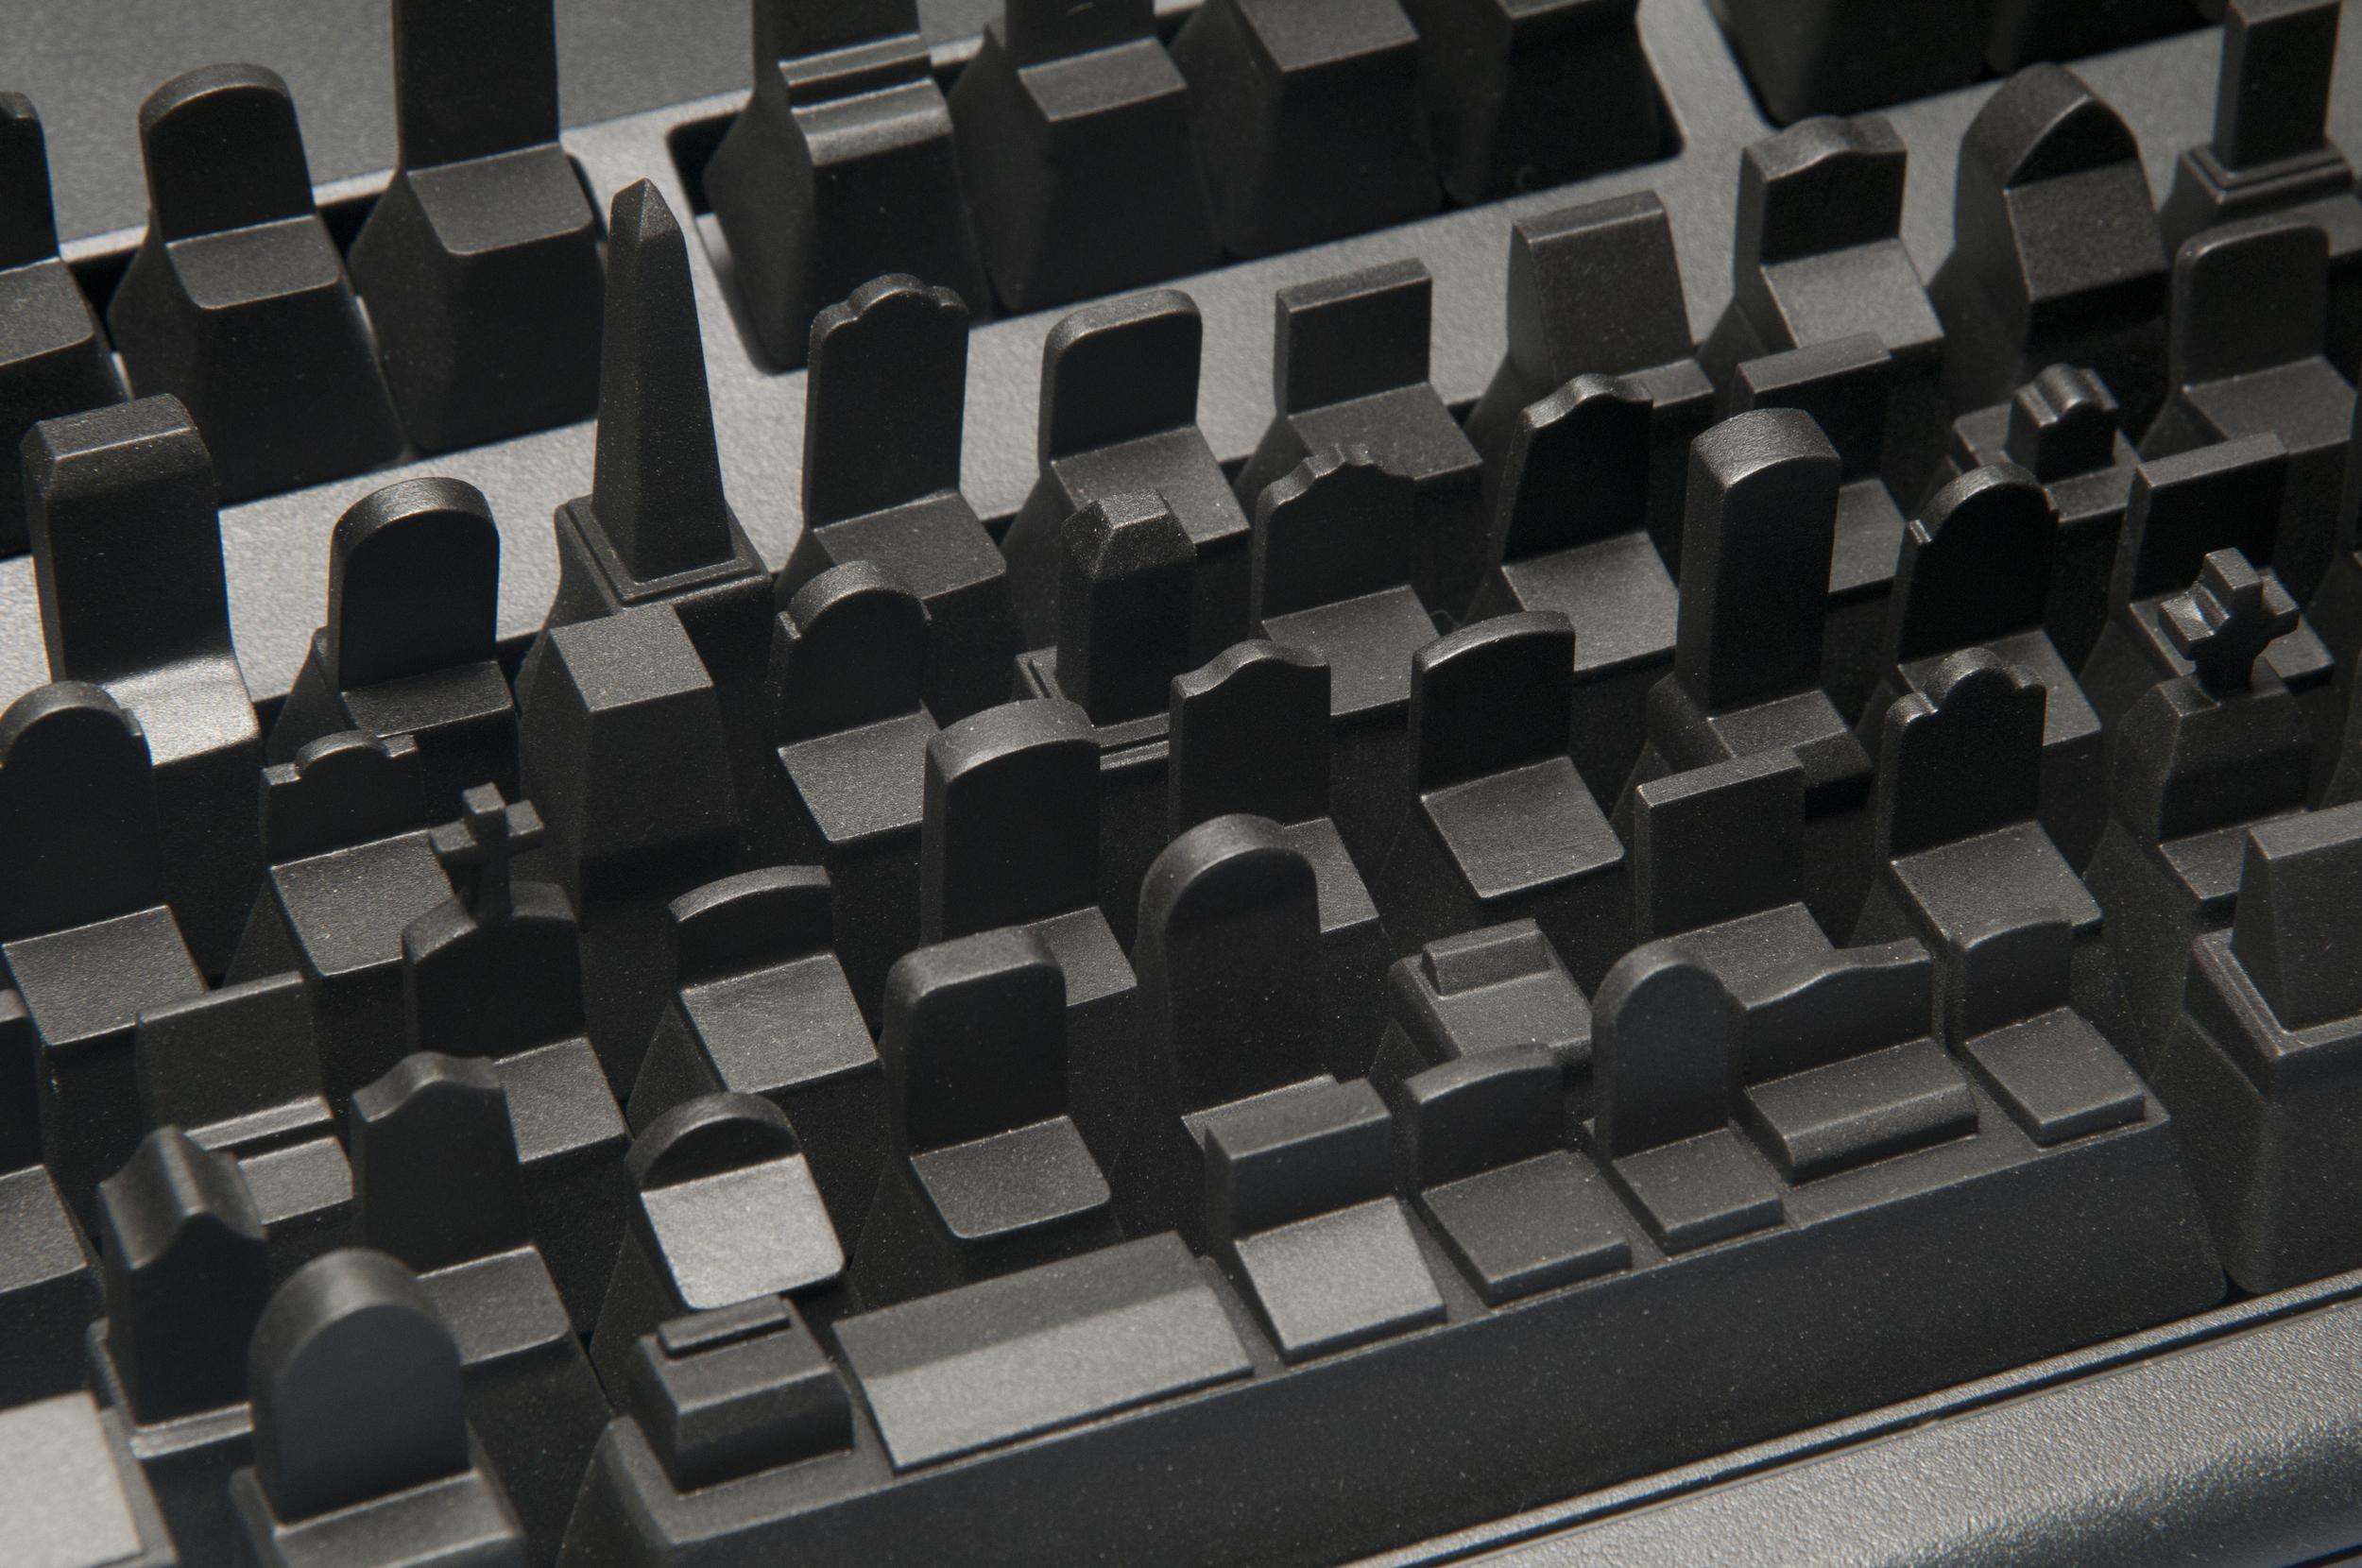 chan_keyboard_blk_detail.jpg